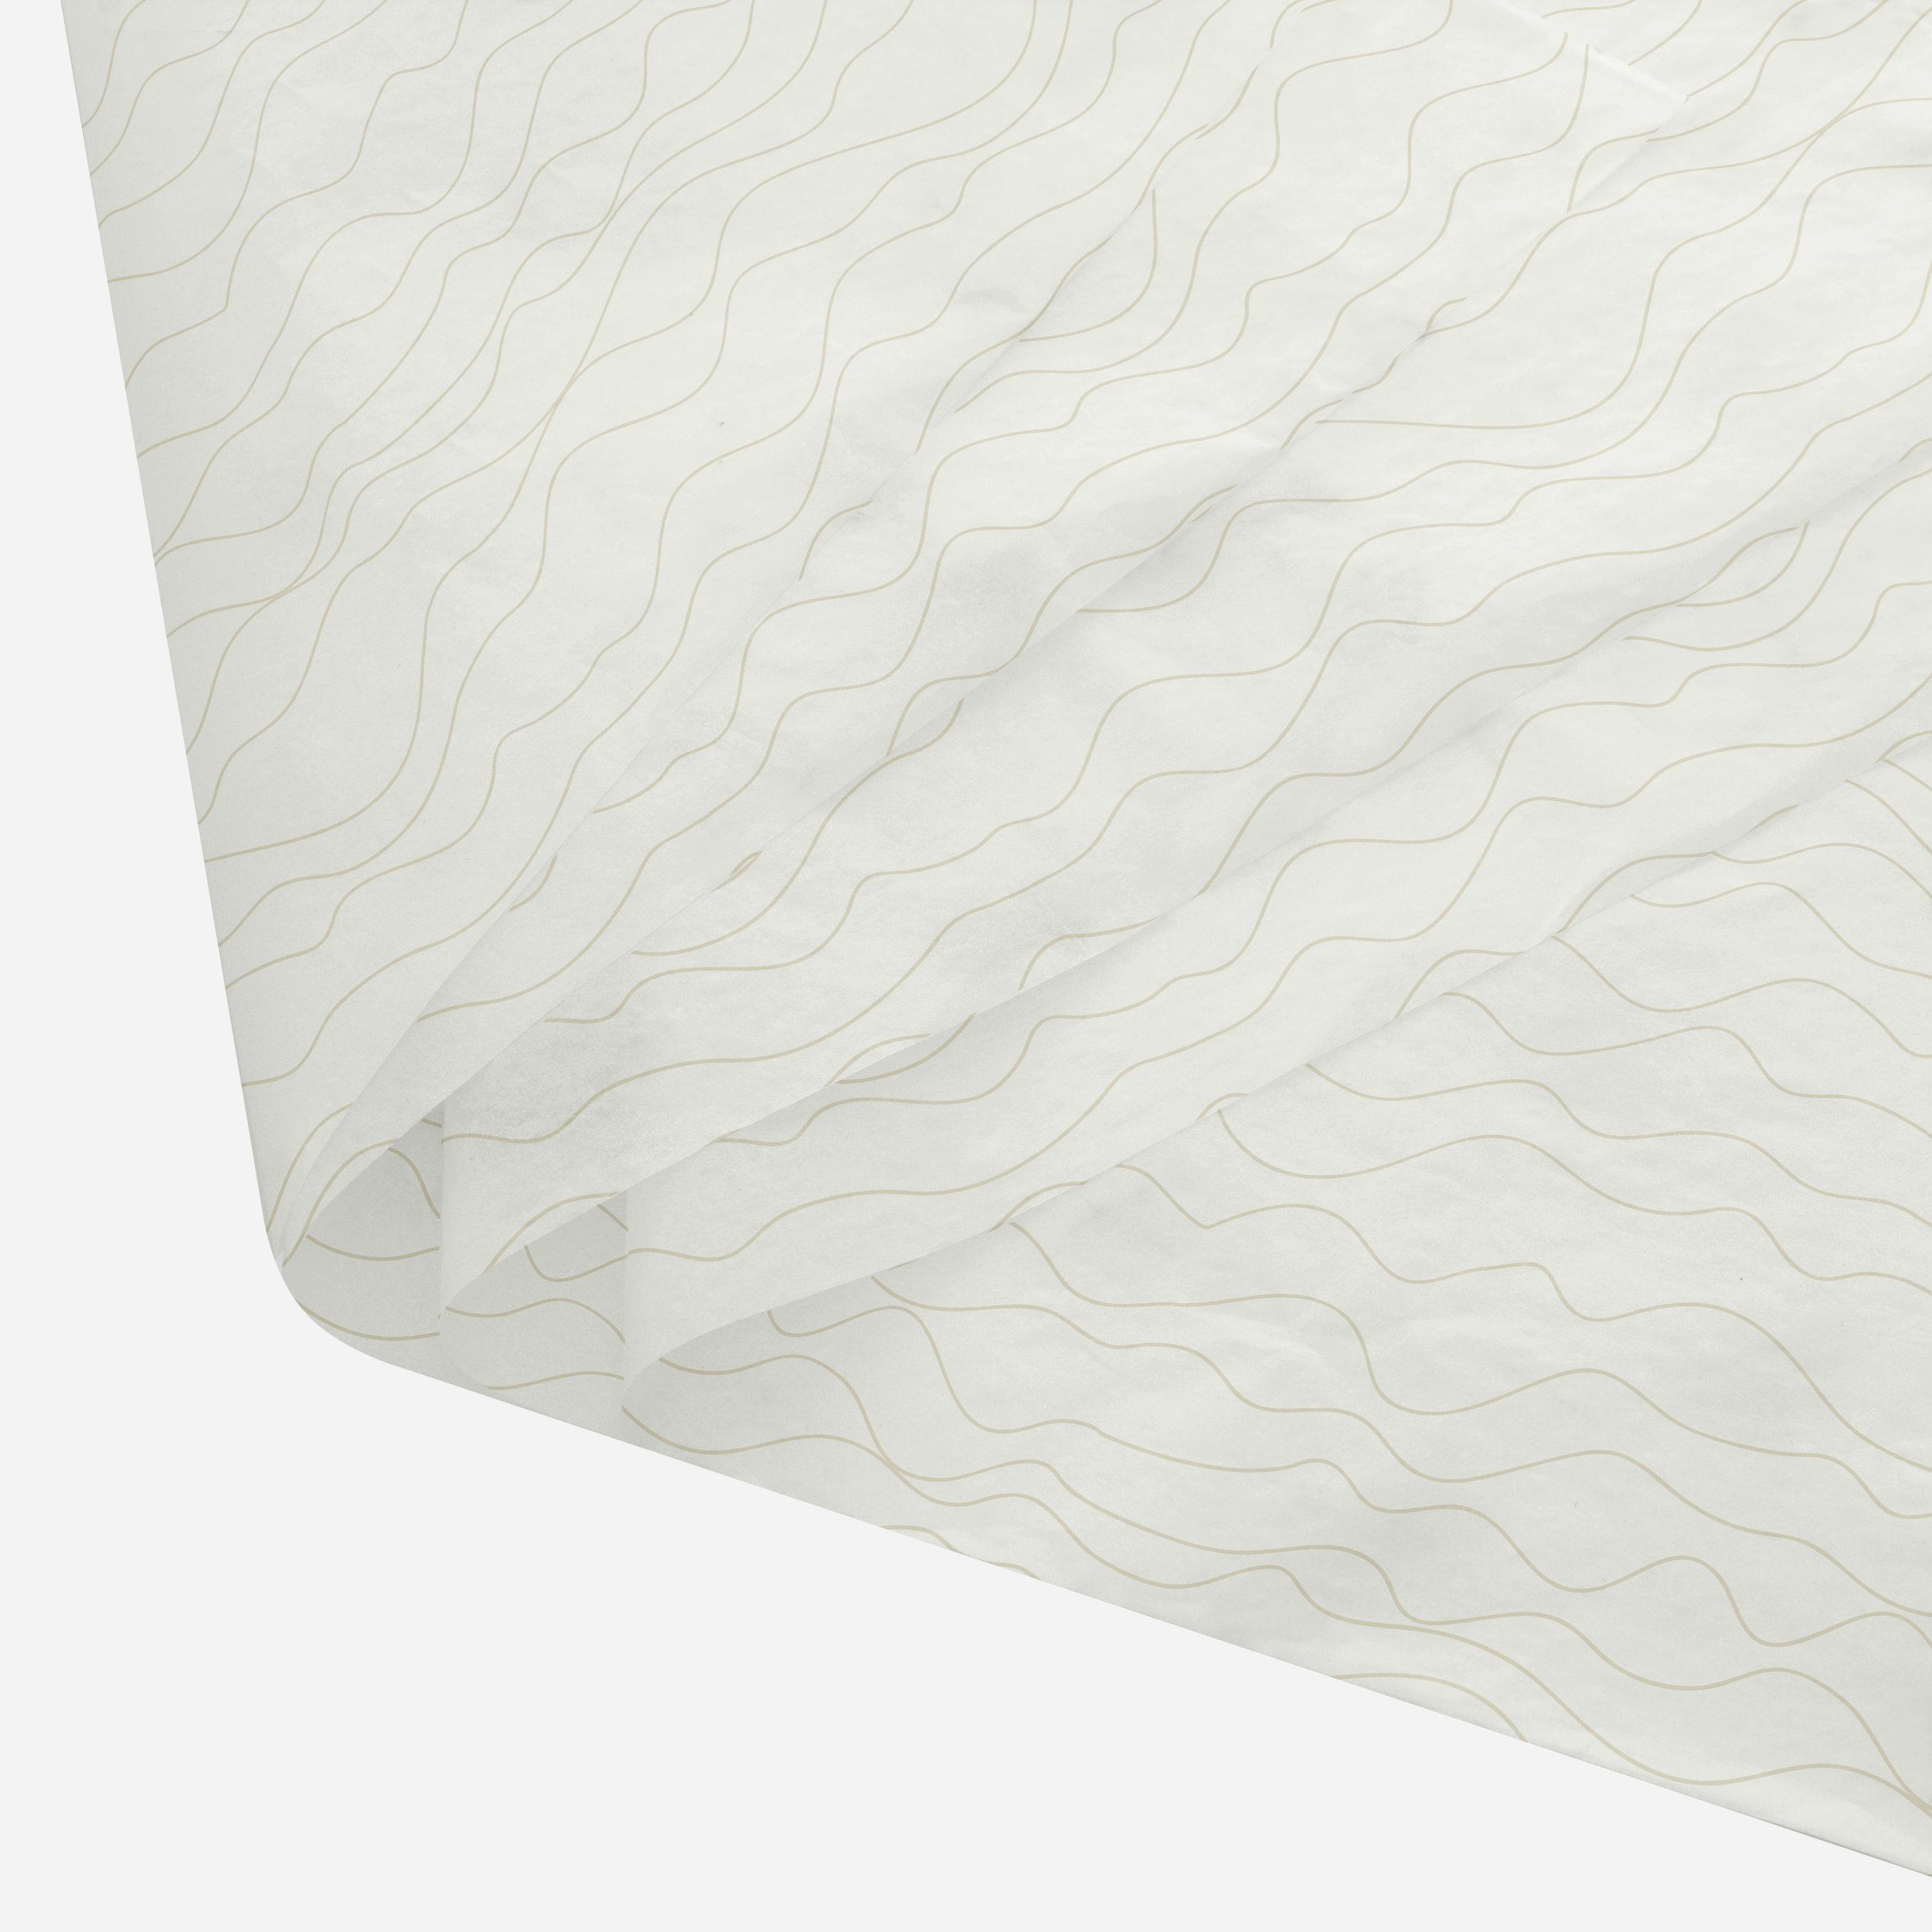 tissue2.jpg